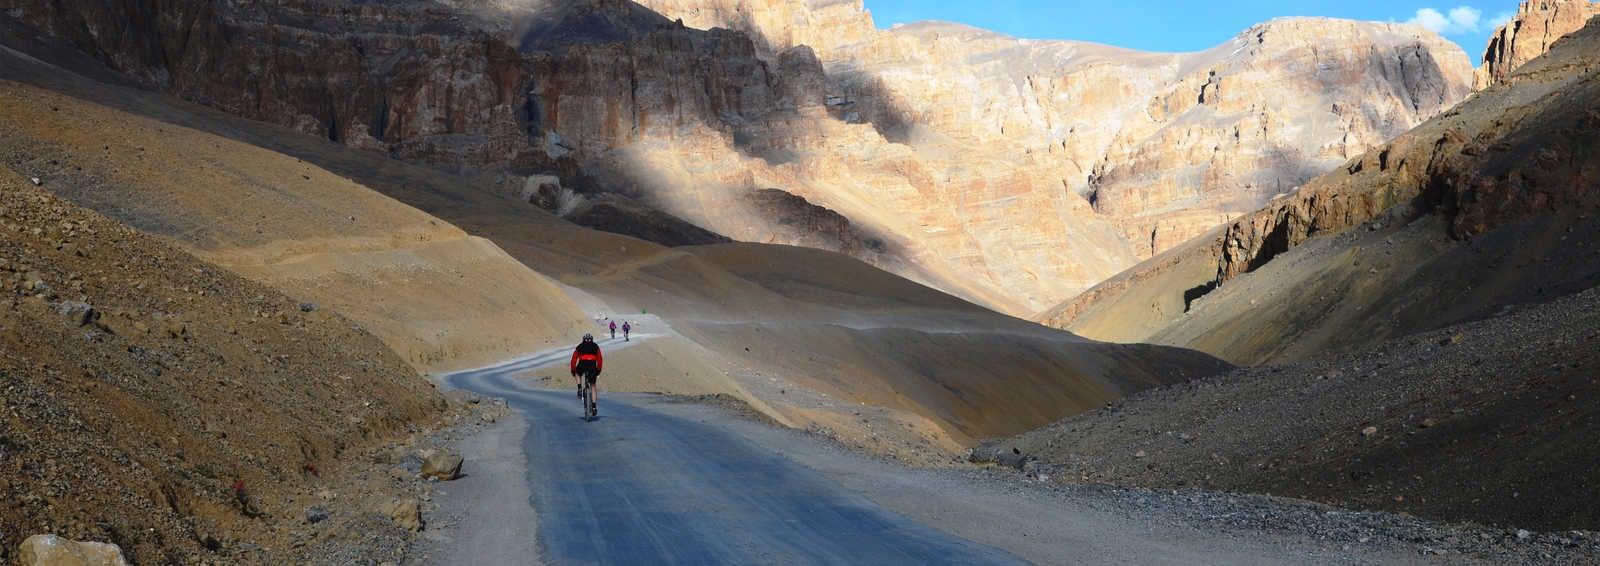 Manali to Leh Ride, India